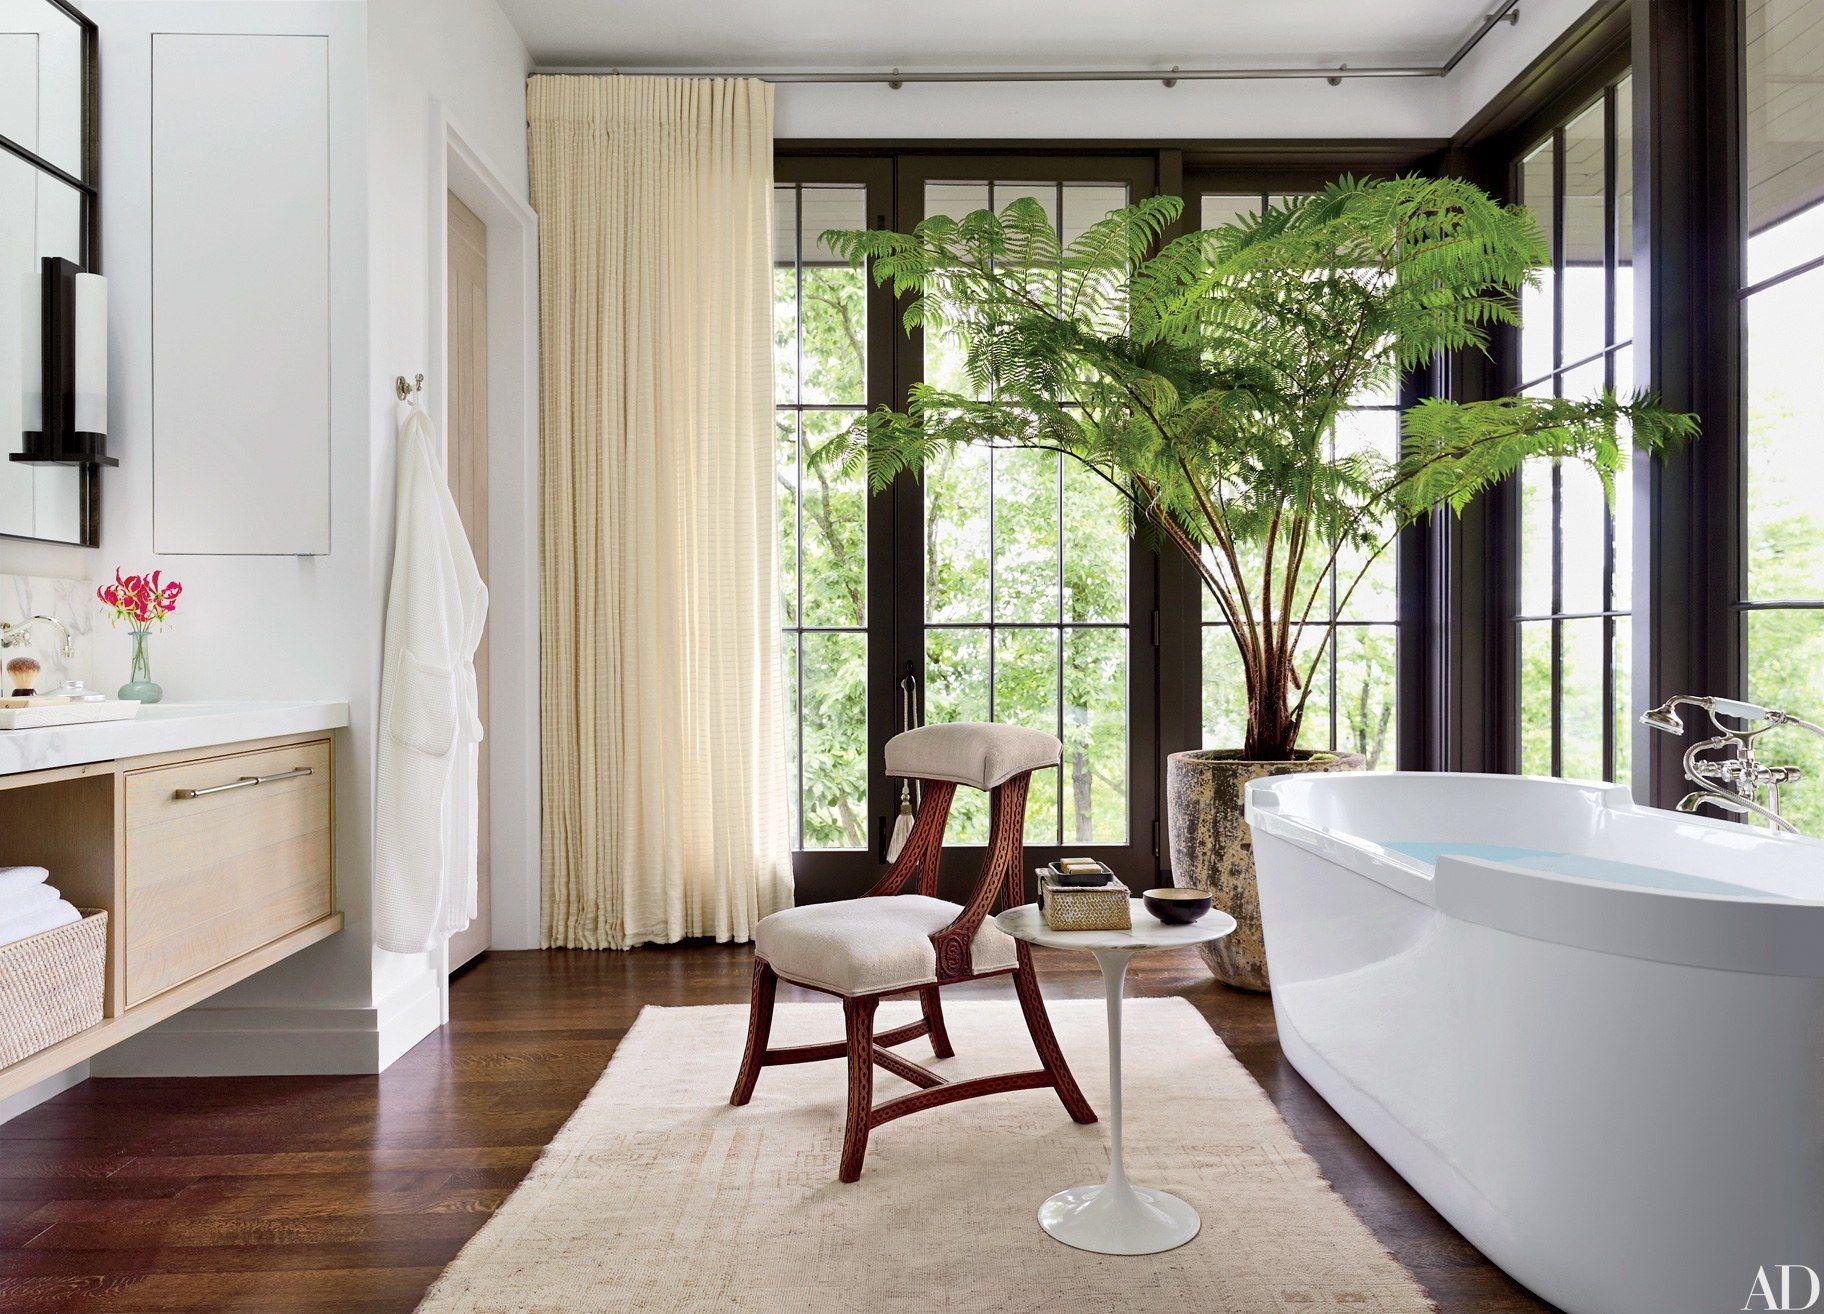 37 bathroom design ideas to inspire your next renovation 37 bathroom design ideas to inspire your next renovation